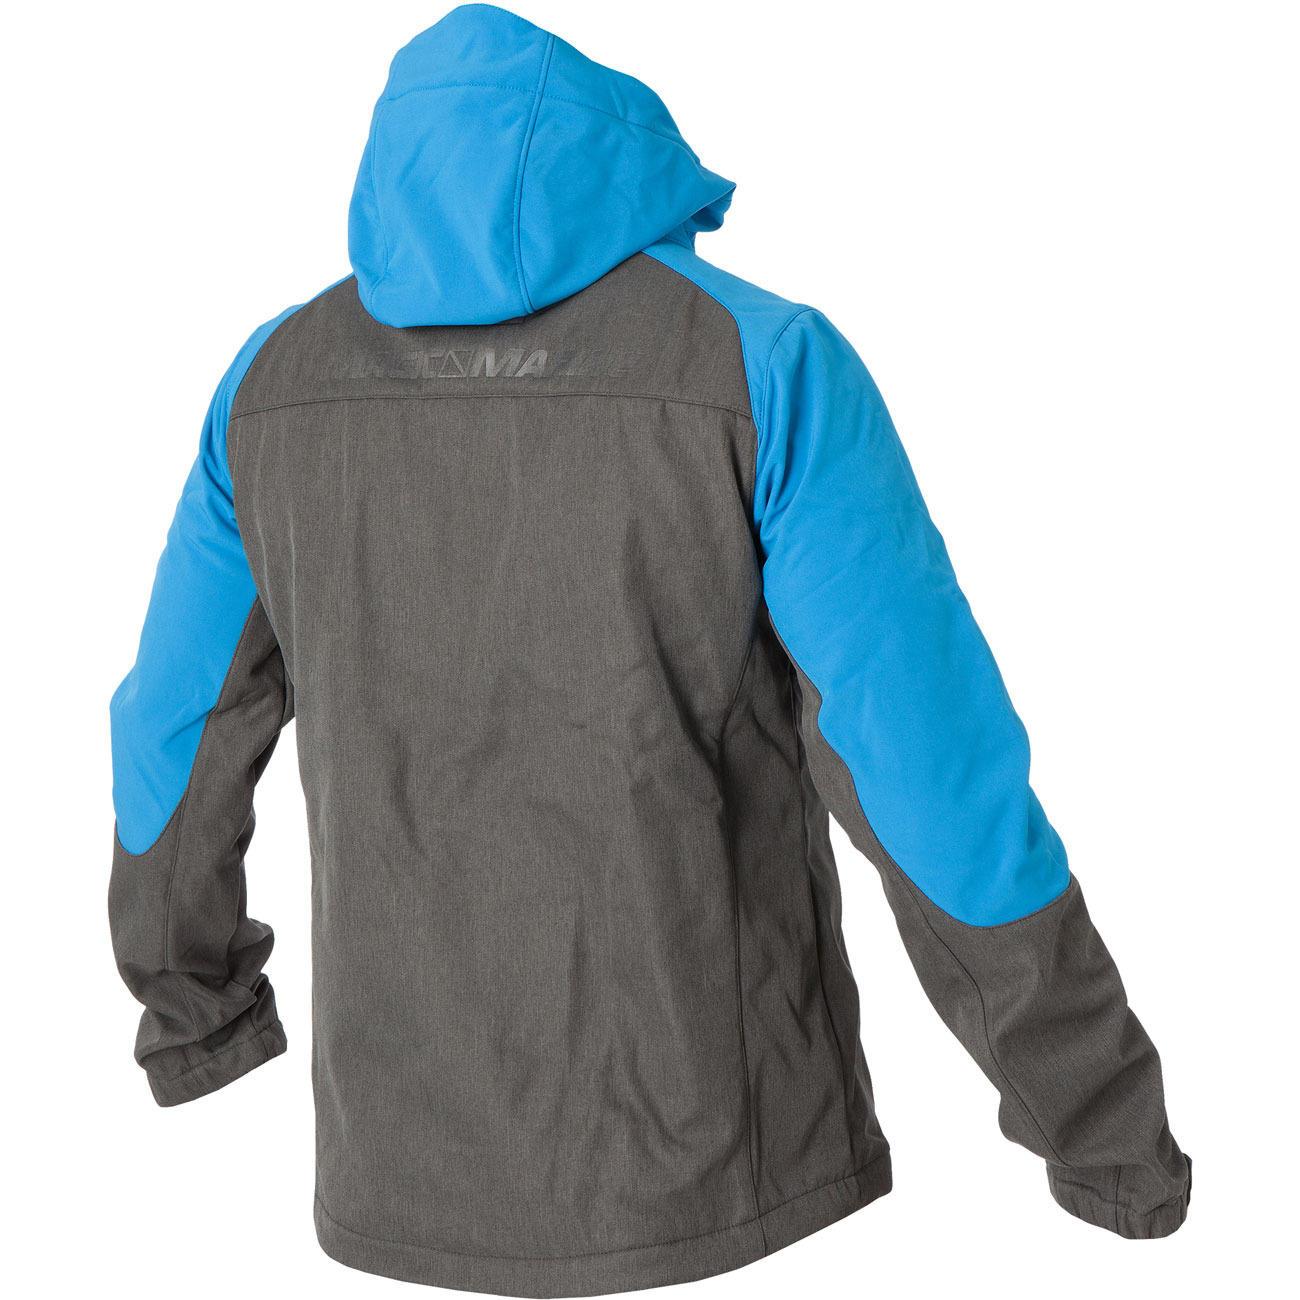 Radar Jacket 3レイヤーソフトシェルジャケット